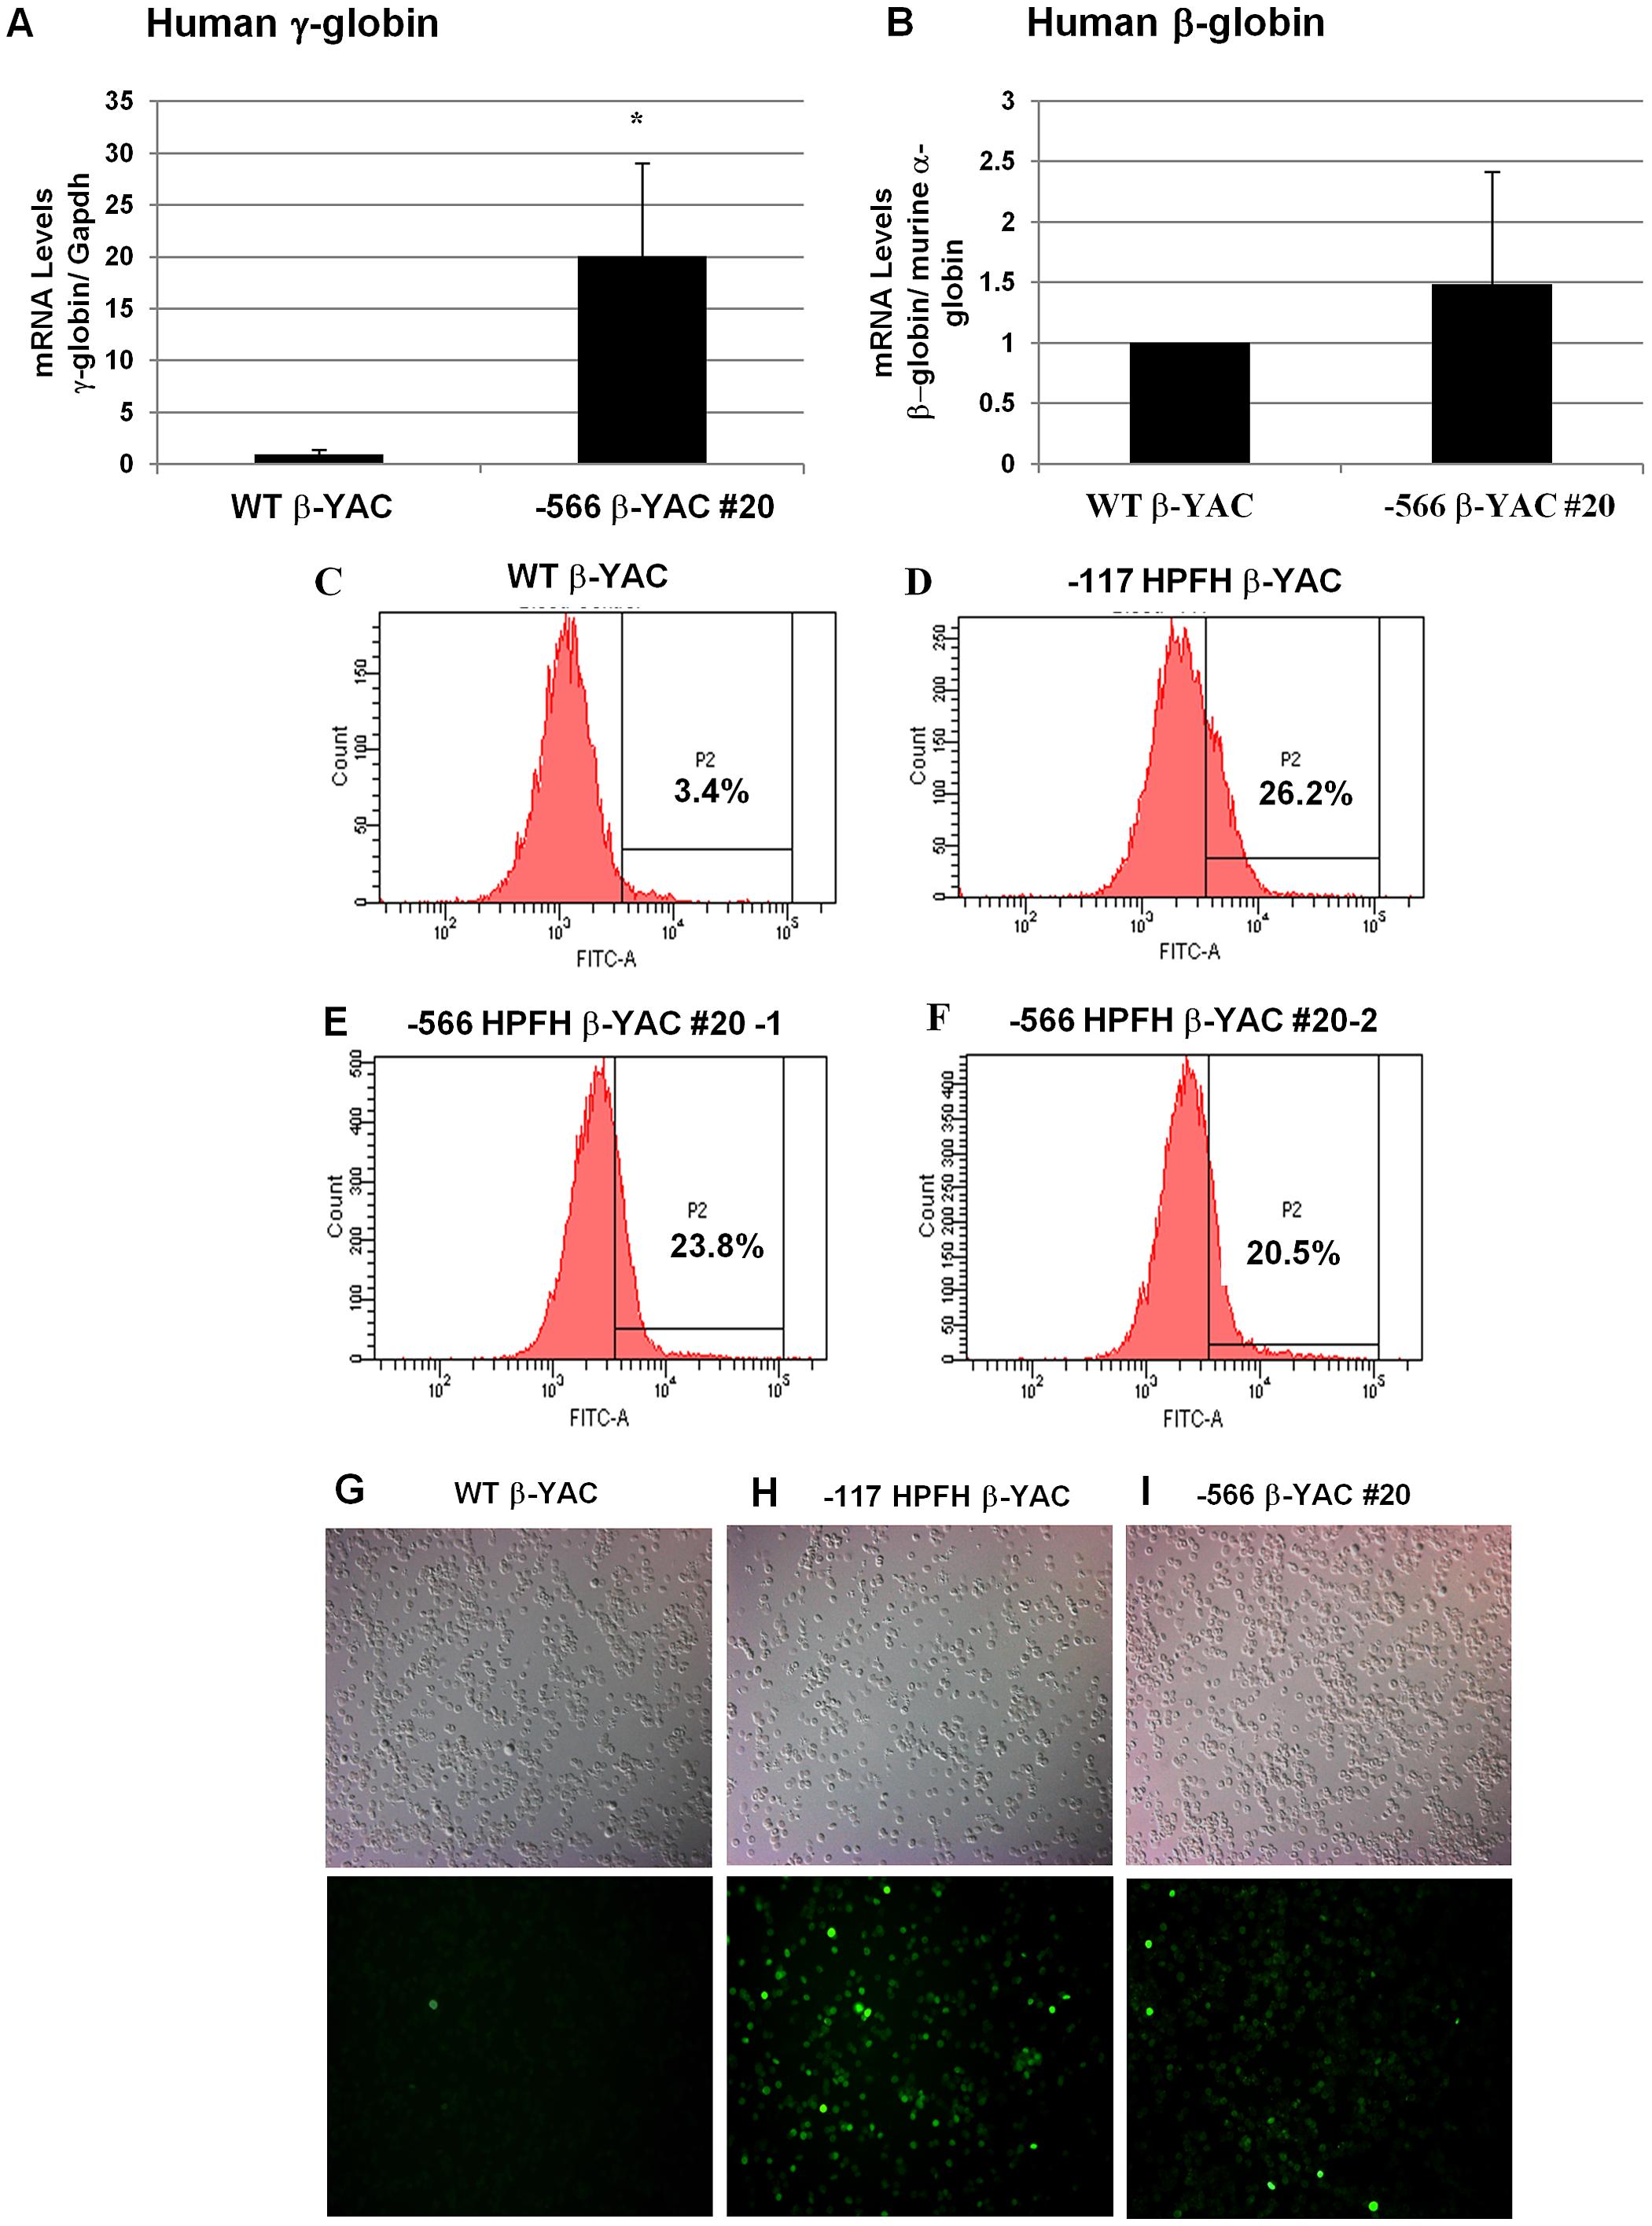 Human β-like globin expression in adult −566 <sup>A</sup>γ-globin HPFH β-YAC transgenic mice.